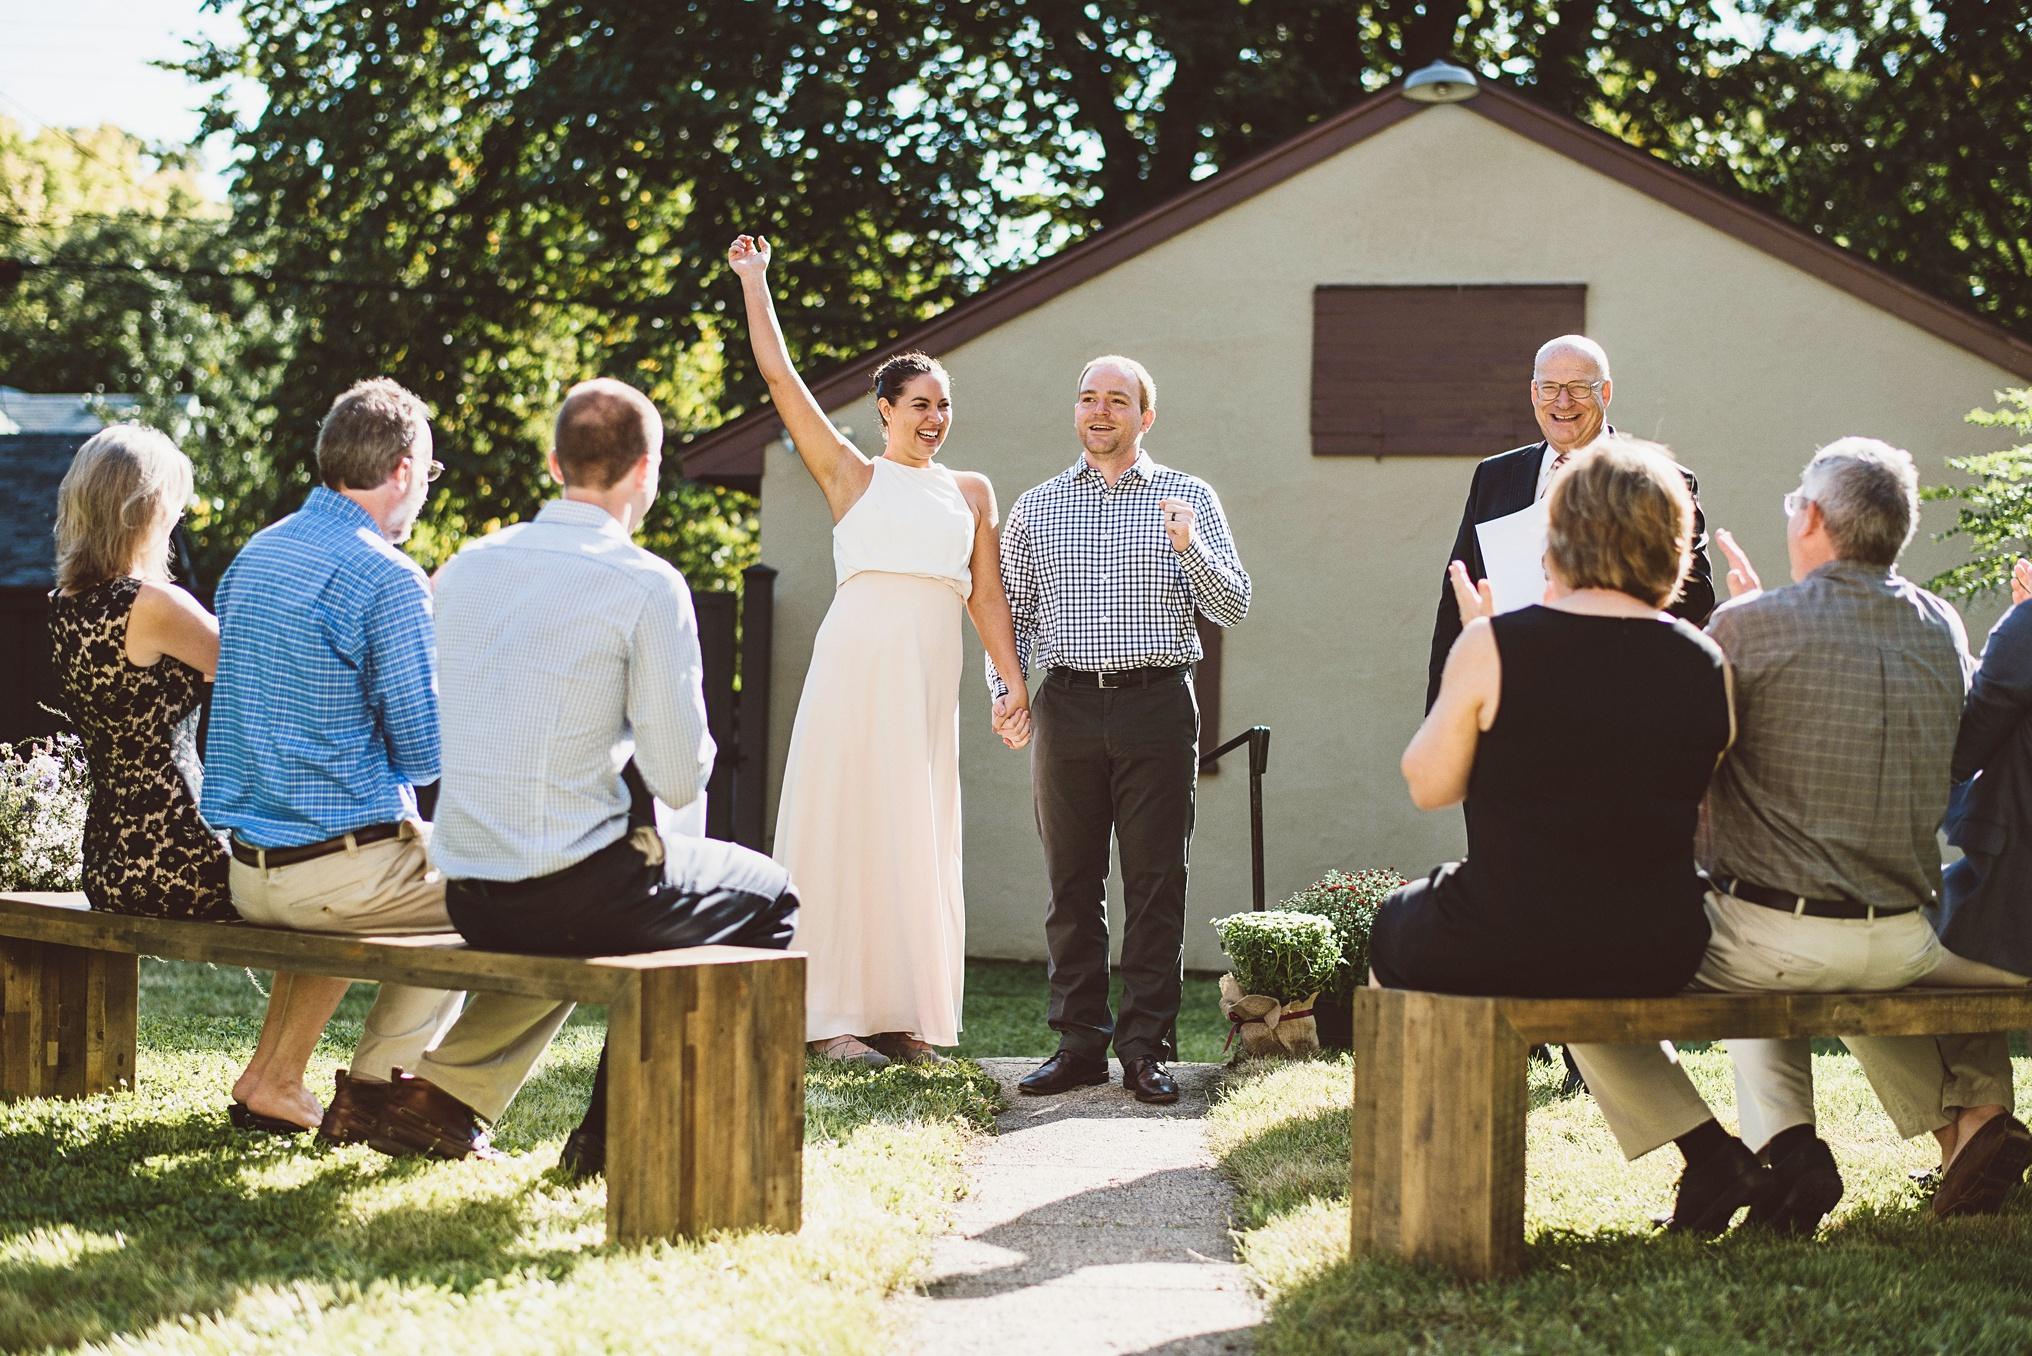 best_wedding_photography_2017_by_lucas_botz_photography_080.jpg